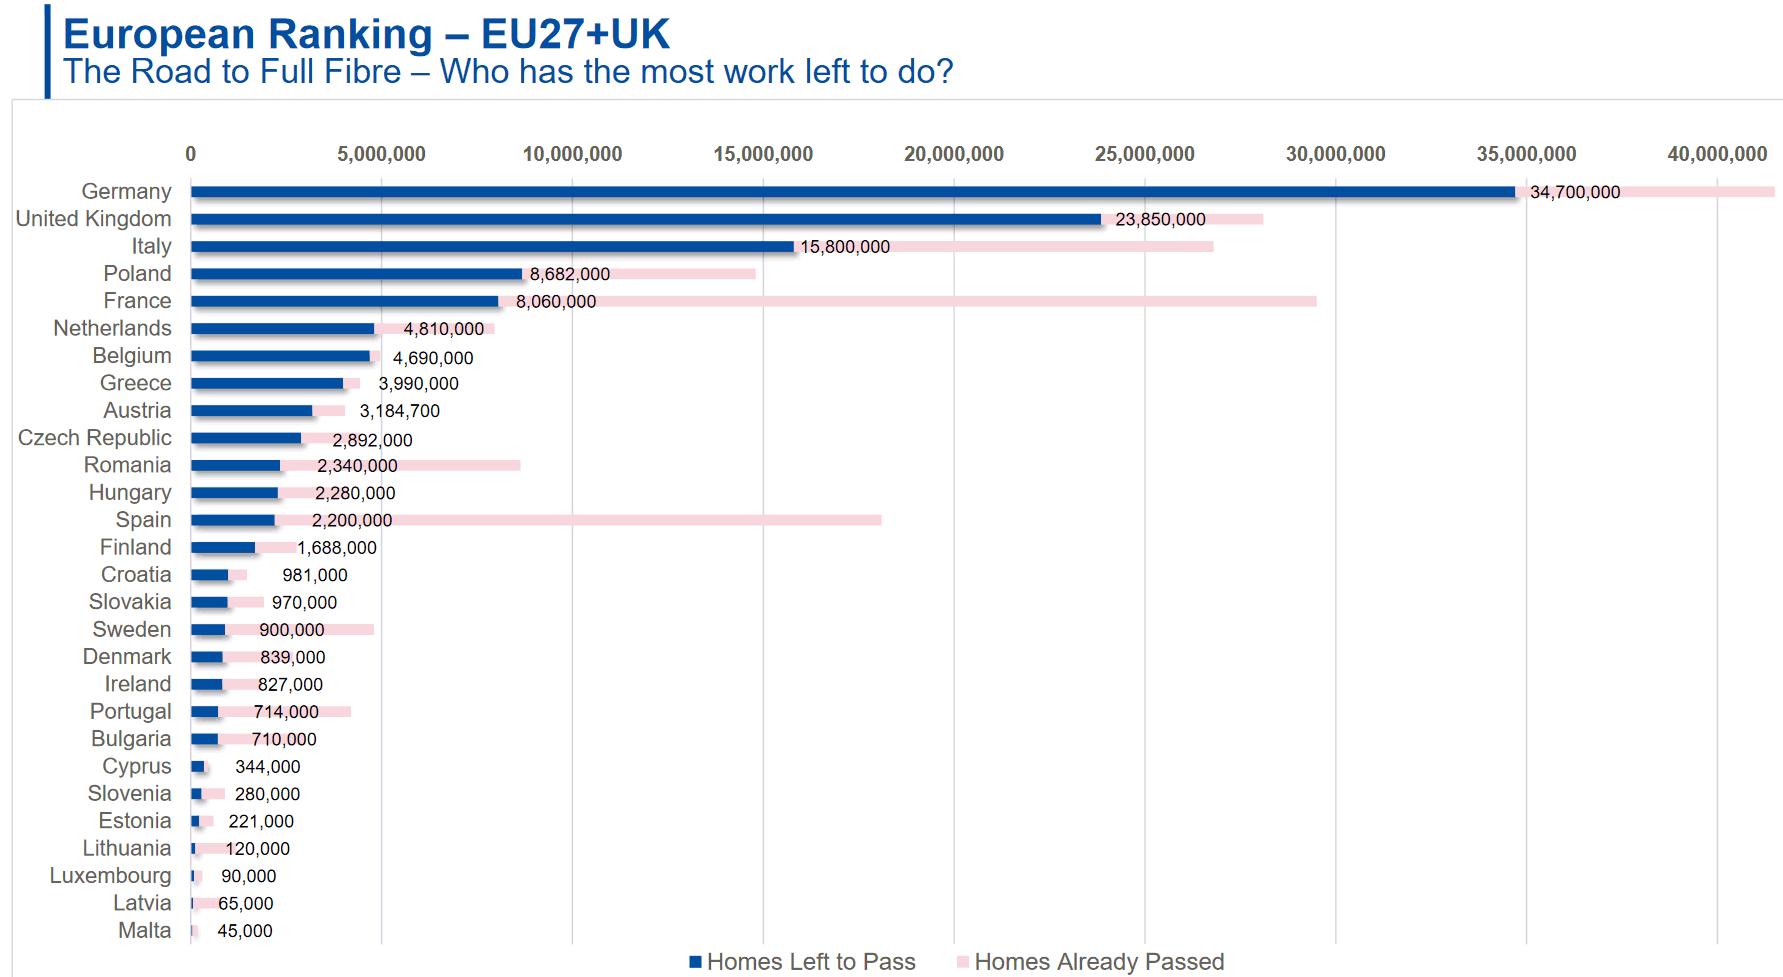 ftth_european_country_ranking_work_left_2021_uk